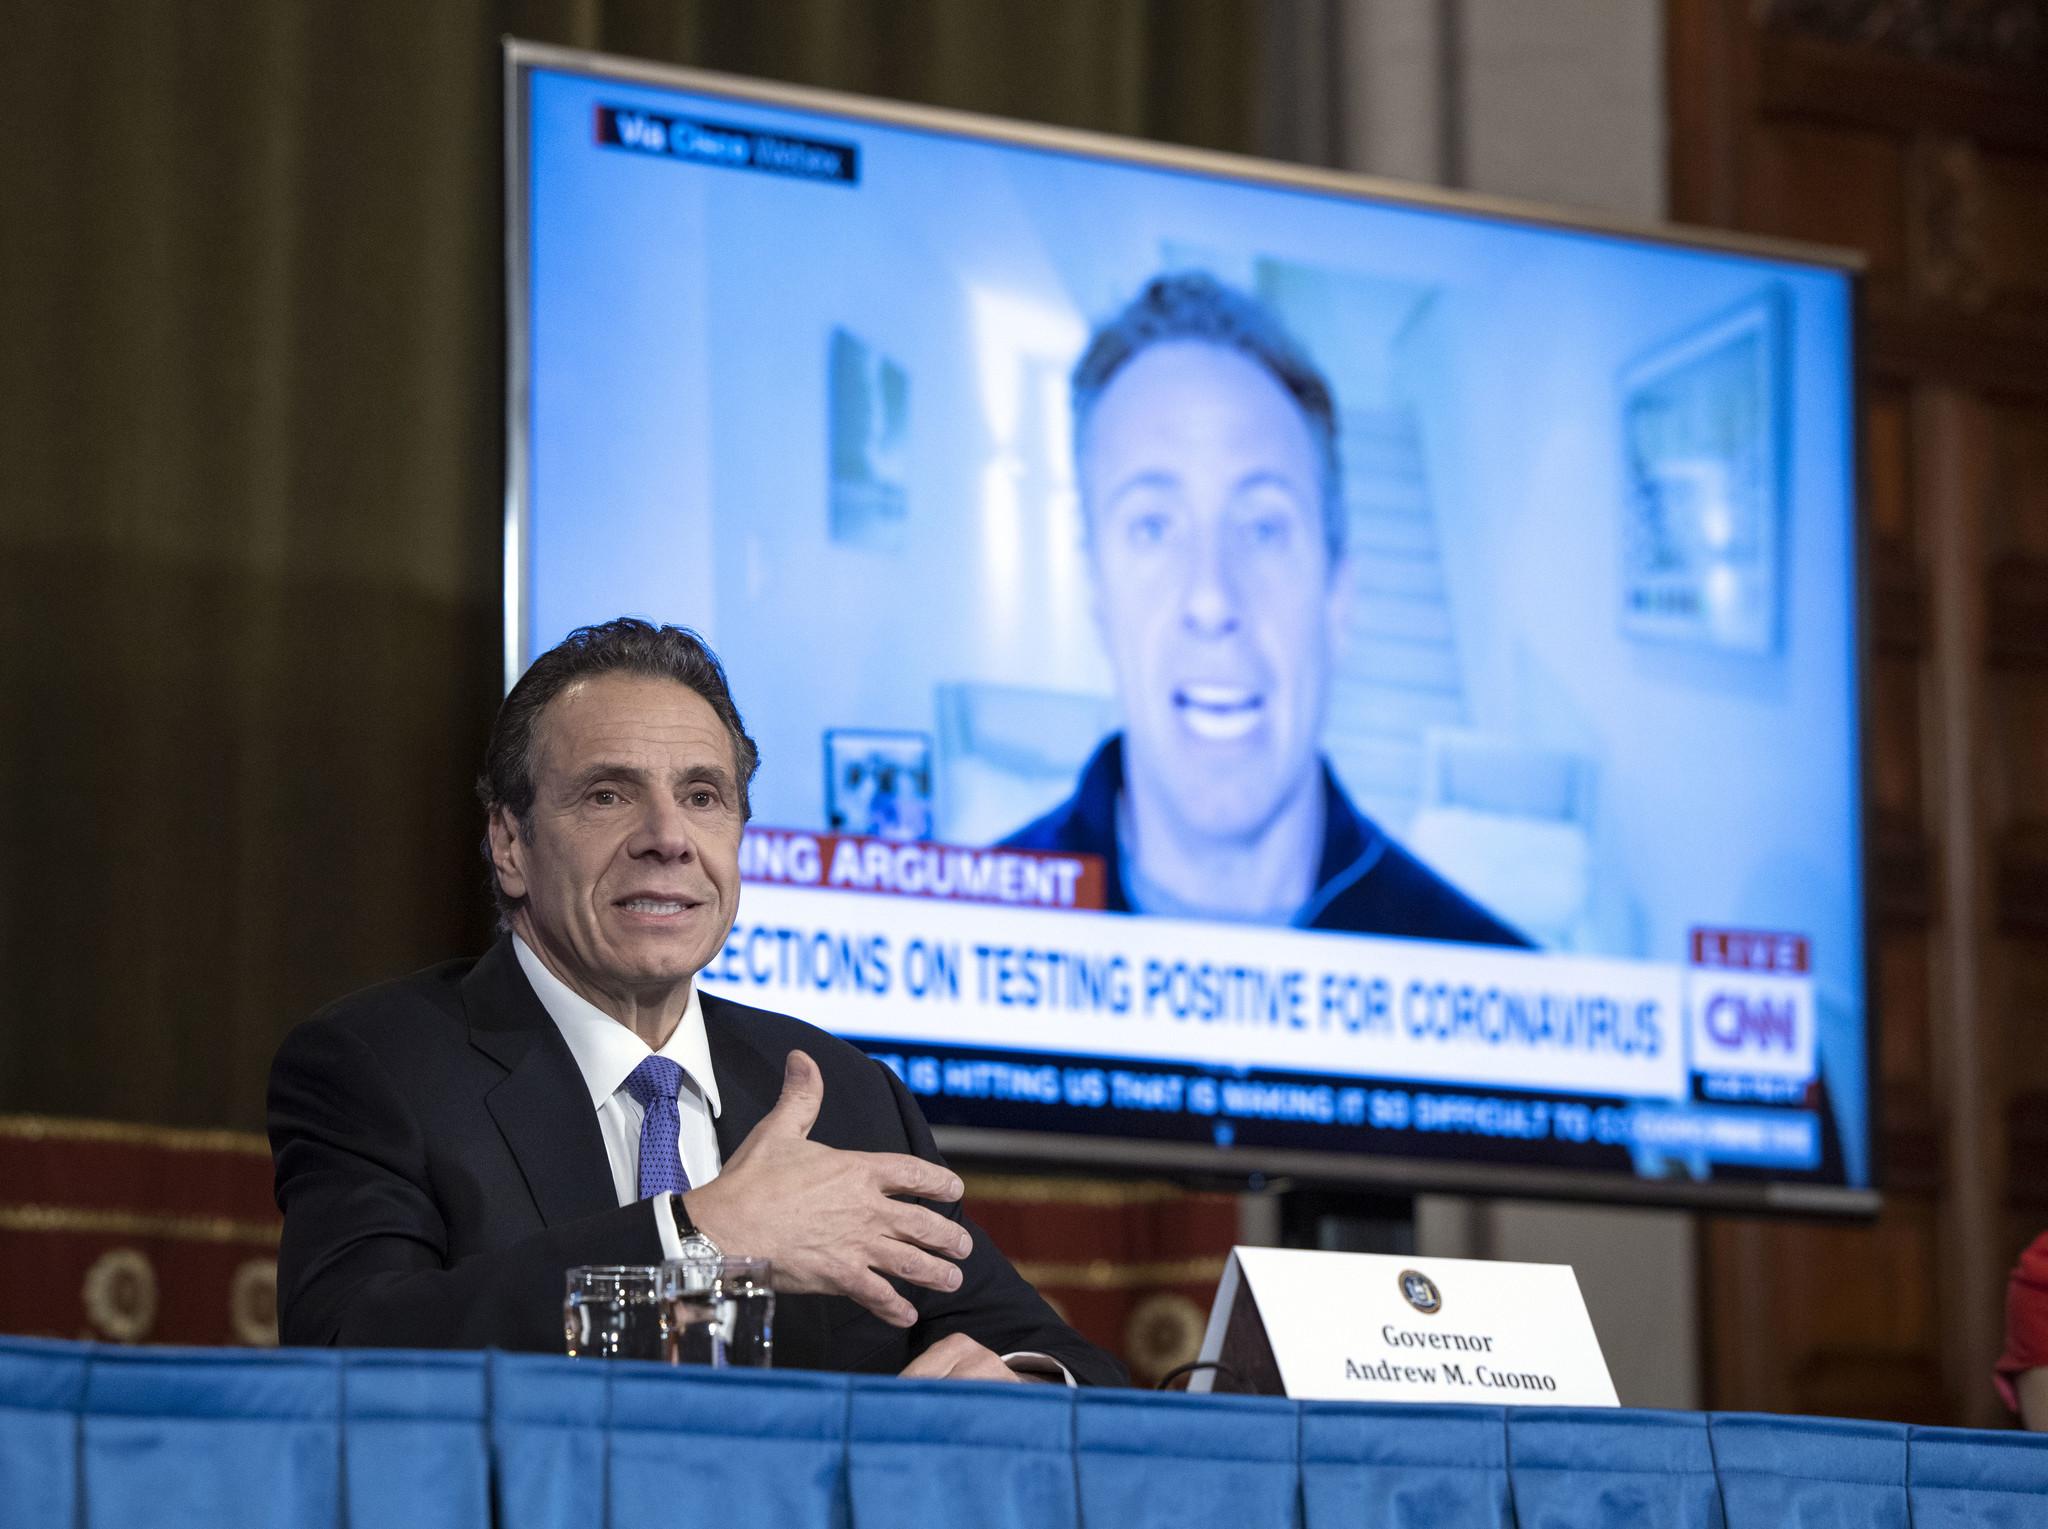 Chris Cuomo having wacky dreams about governor brother 'waving wand' as he battles coronavirus